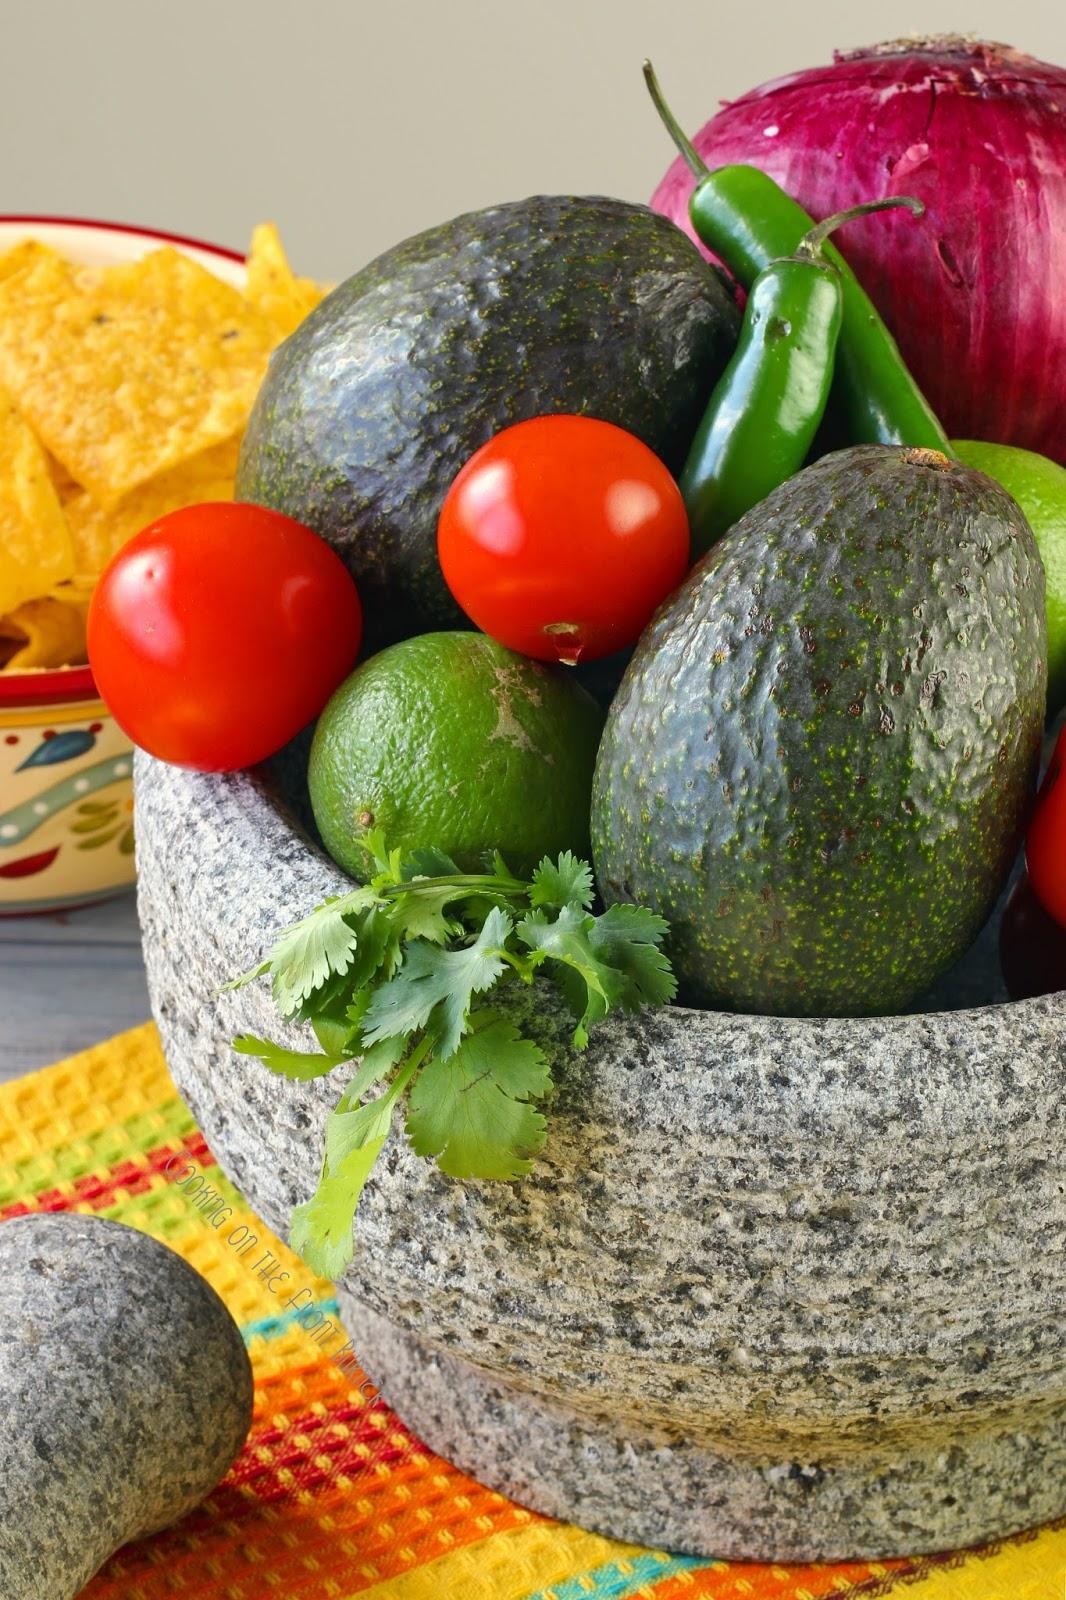 Guacamole | Cooking on the Front Burner #cincodemayo #mexican #guacamole